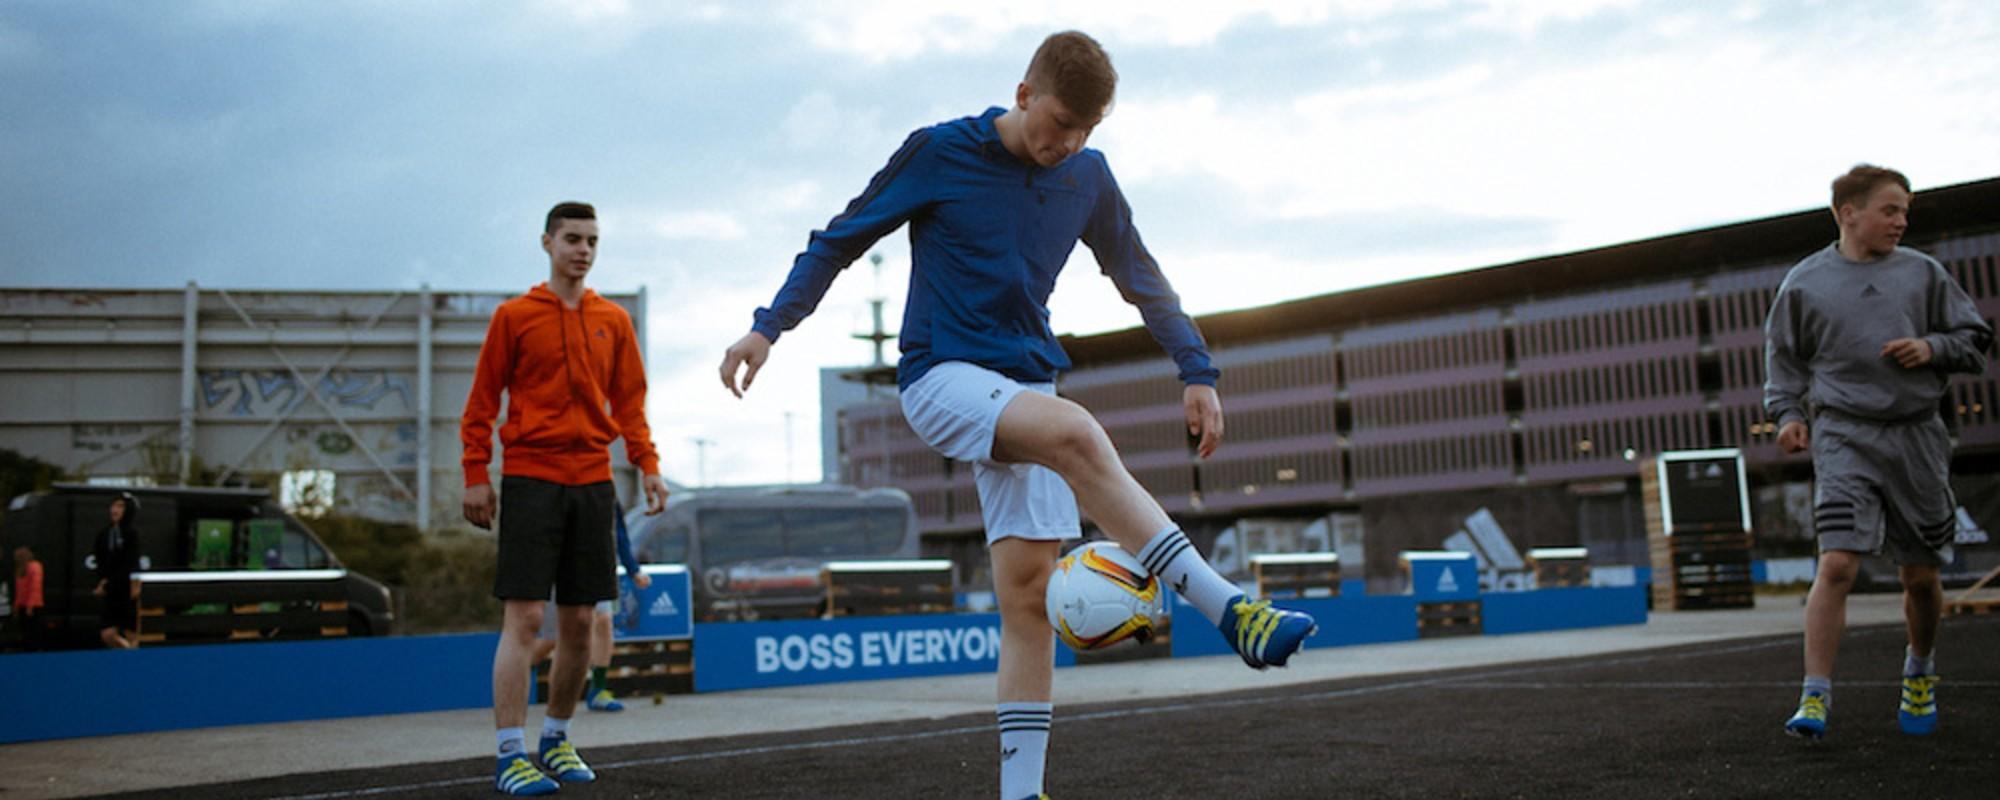 Adidas Kickabout: Zürich